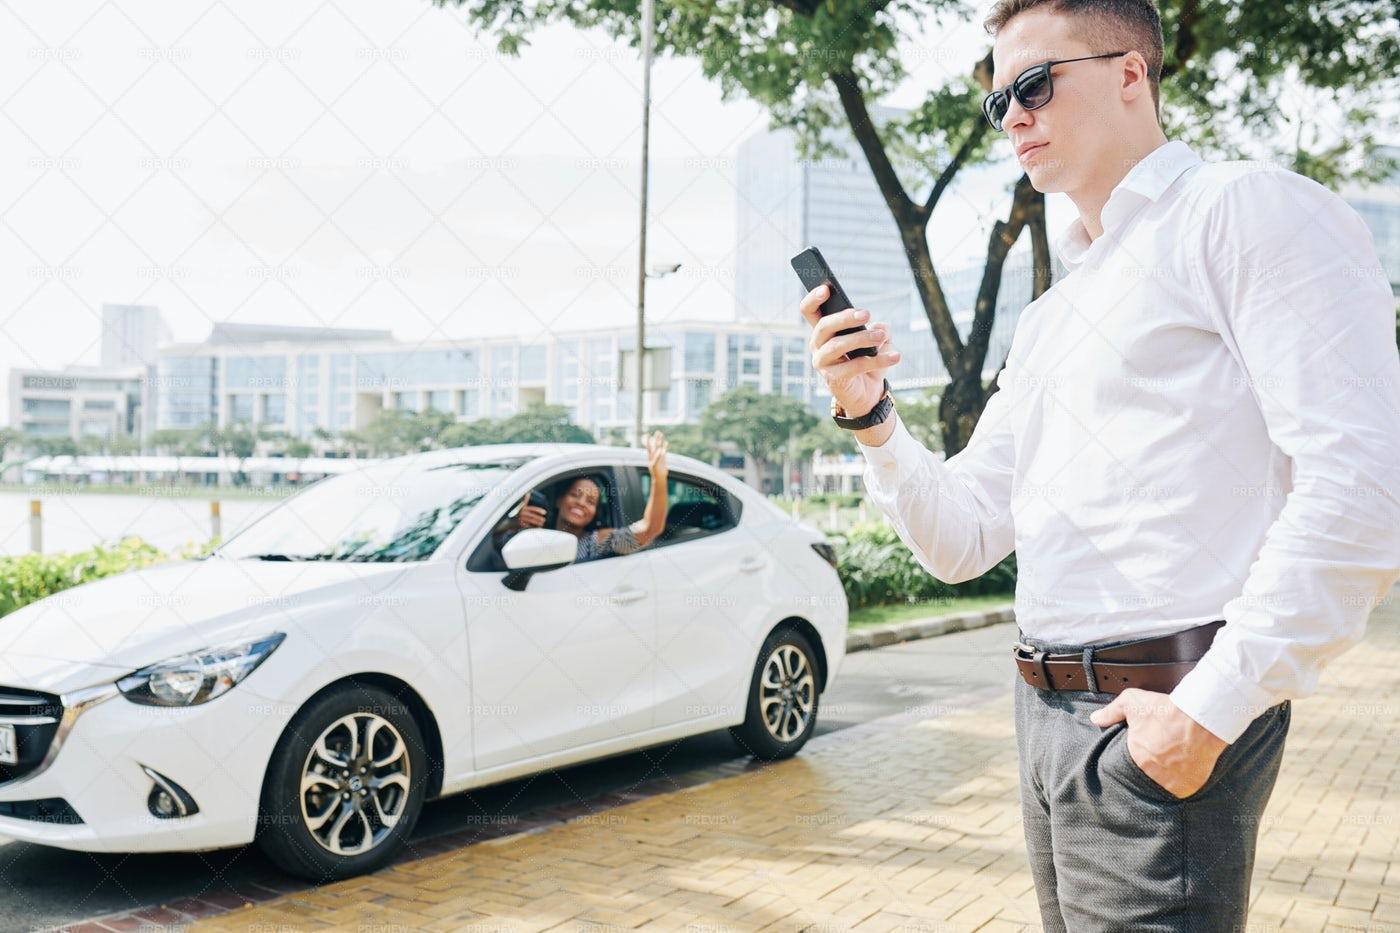 Man Waiting For A Taxi: Stock Photos